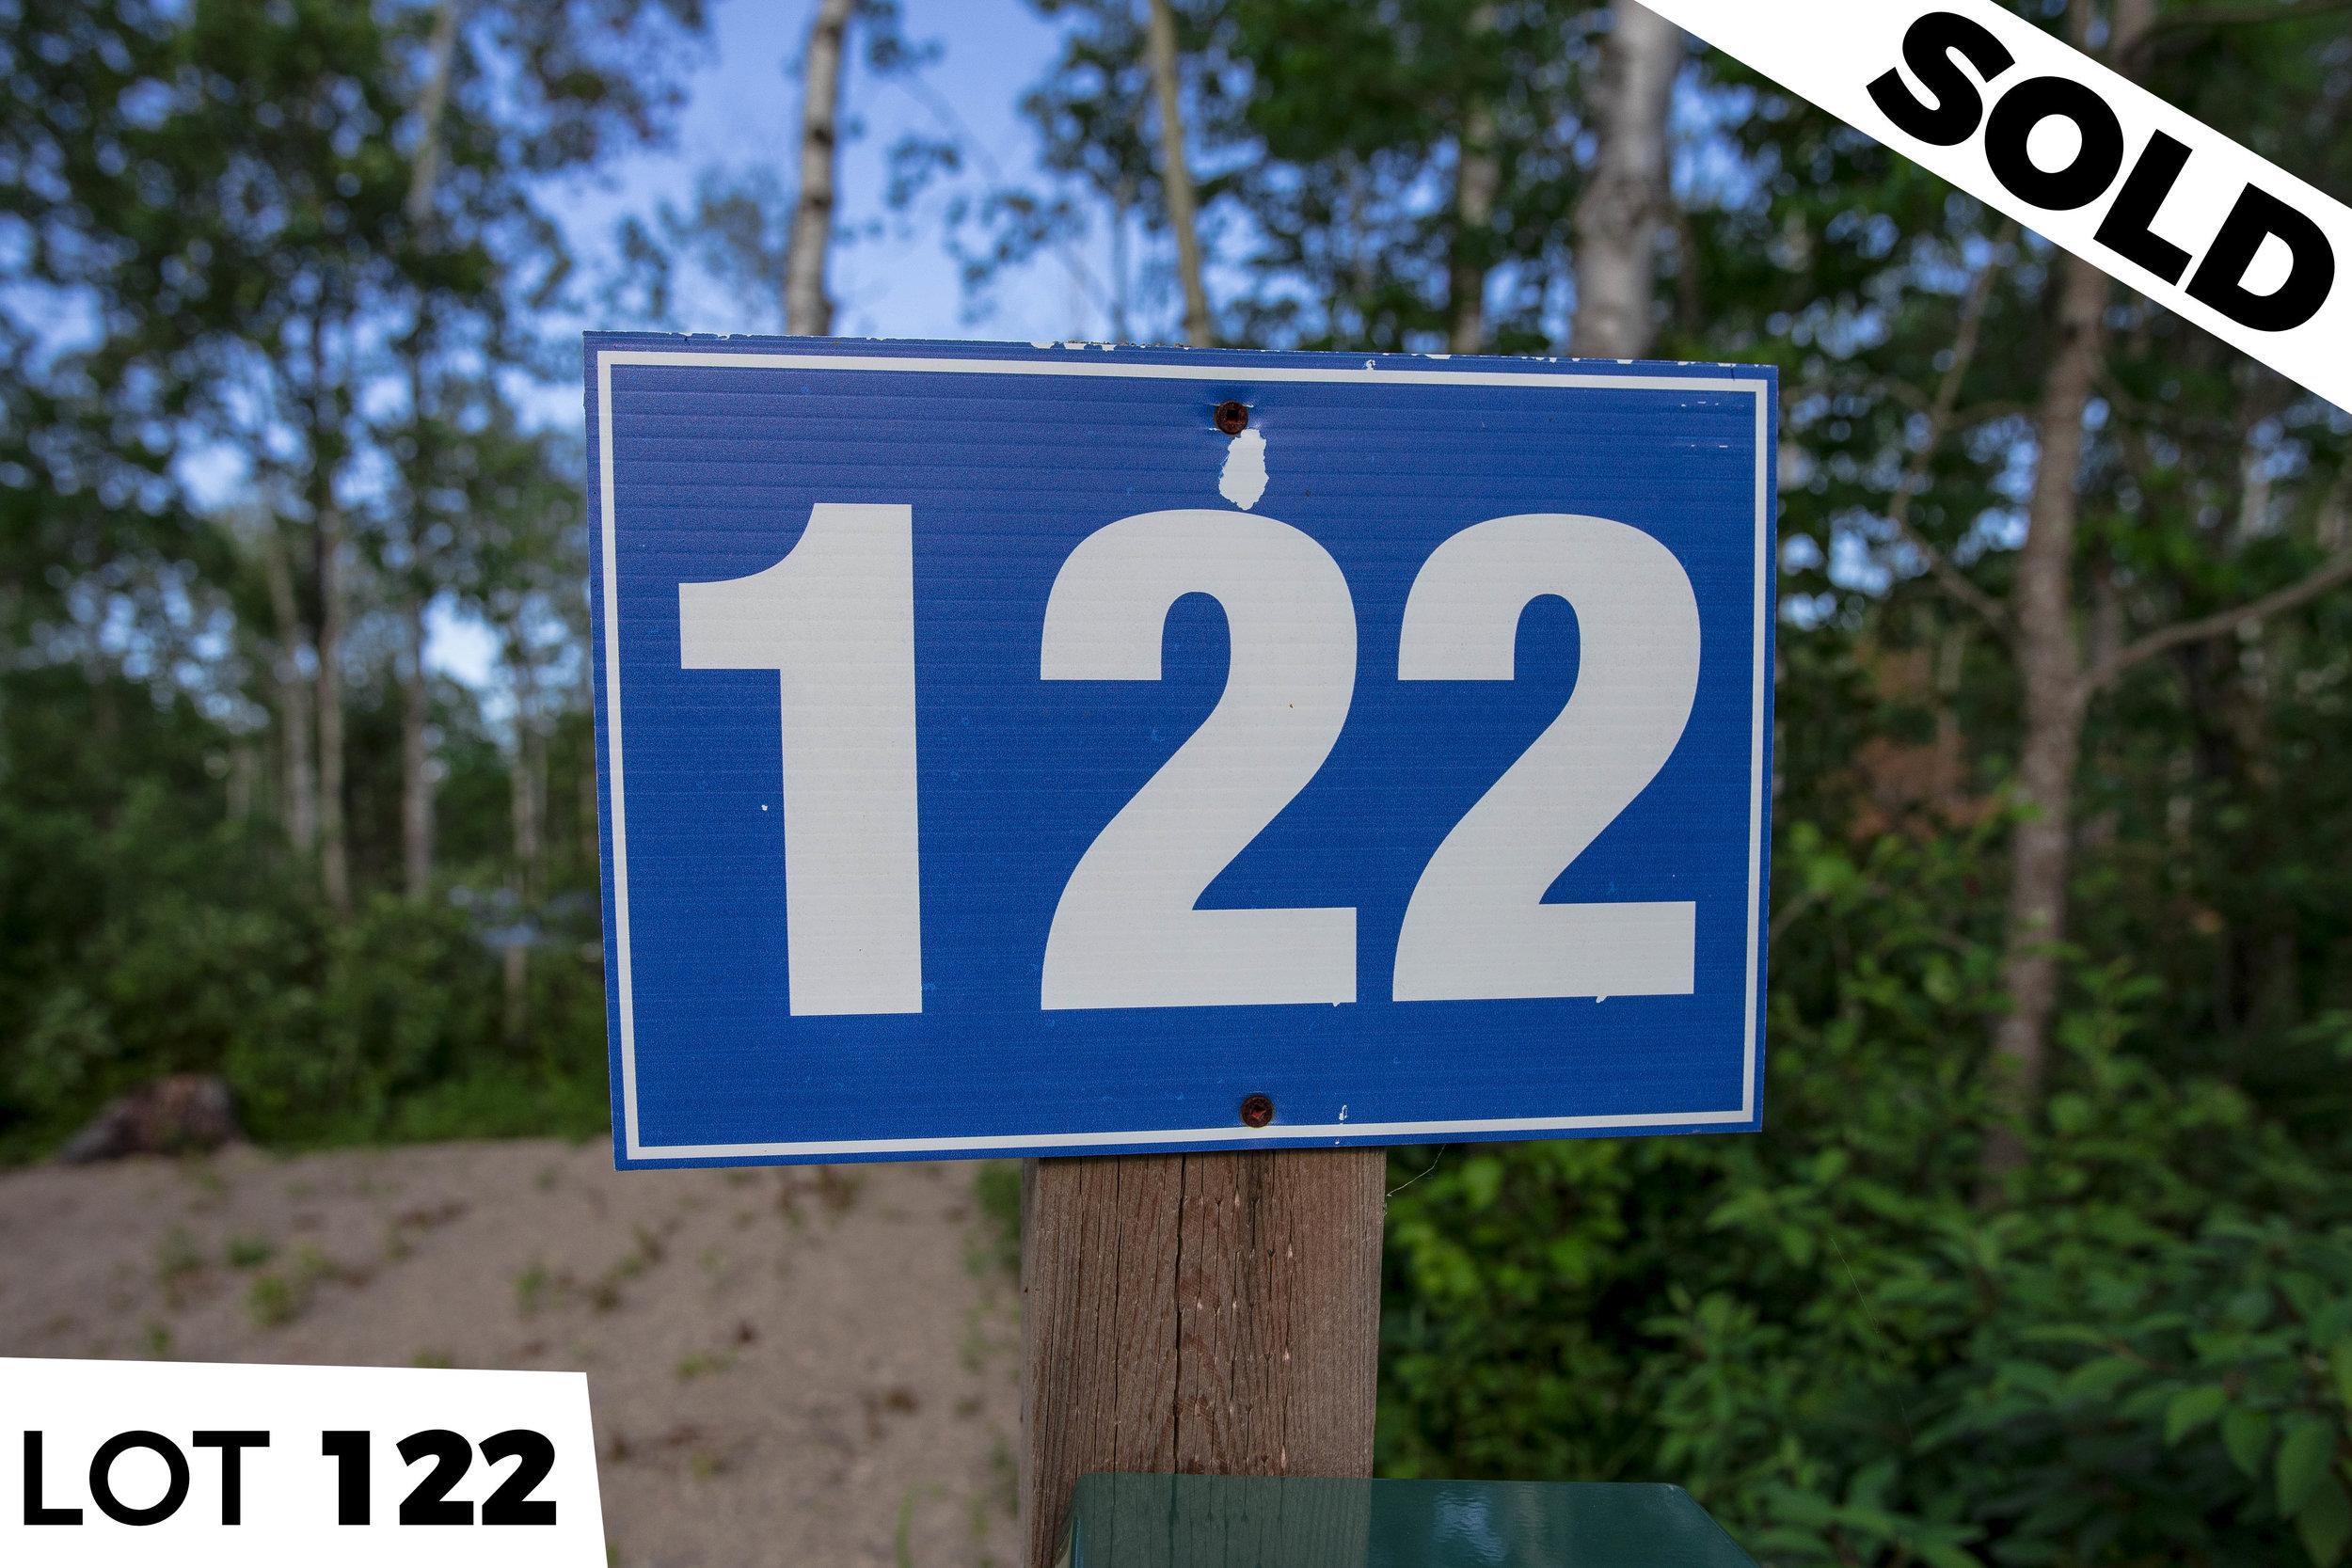 Grand Palms RV Resort - Lot #122